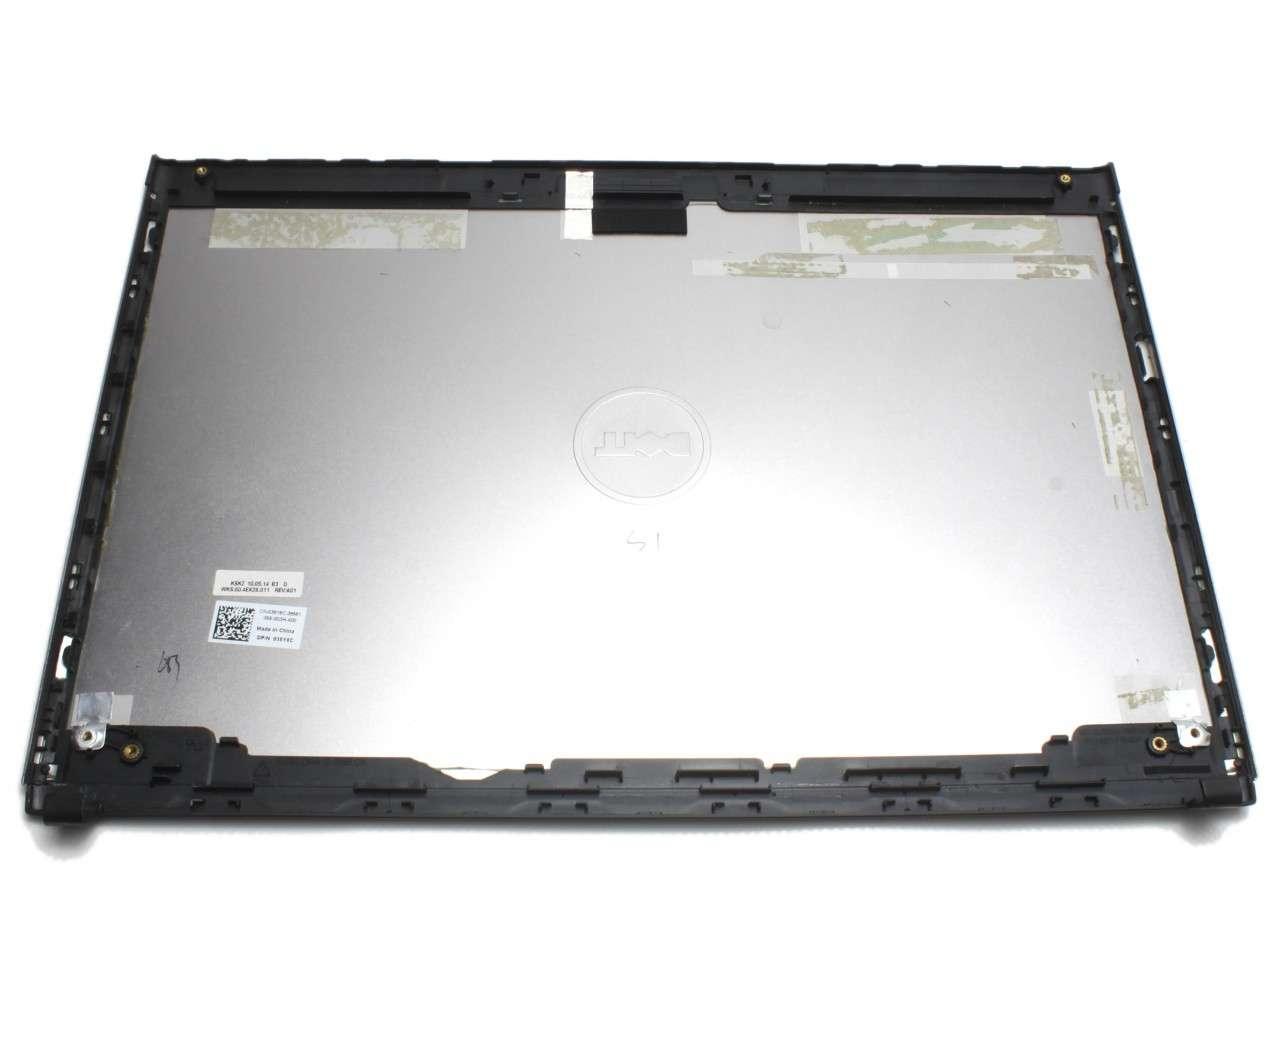 Capac Display BackCover Dell 60 4EX28 011 Carcasa Display imagine powerlaptop.ro 2021